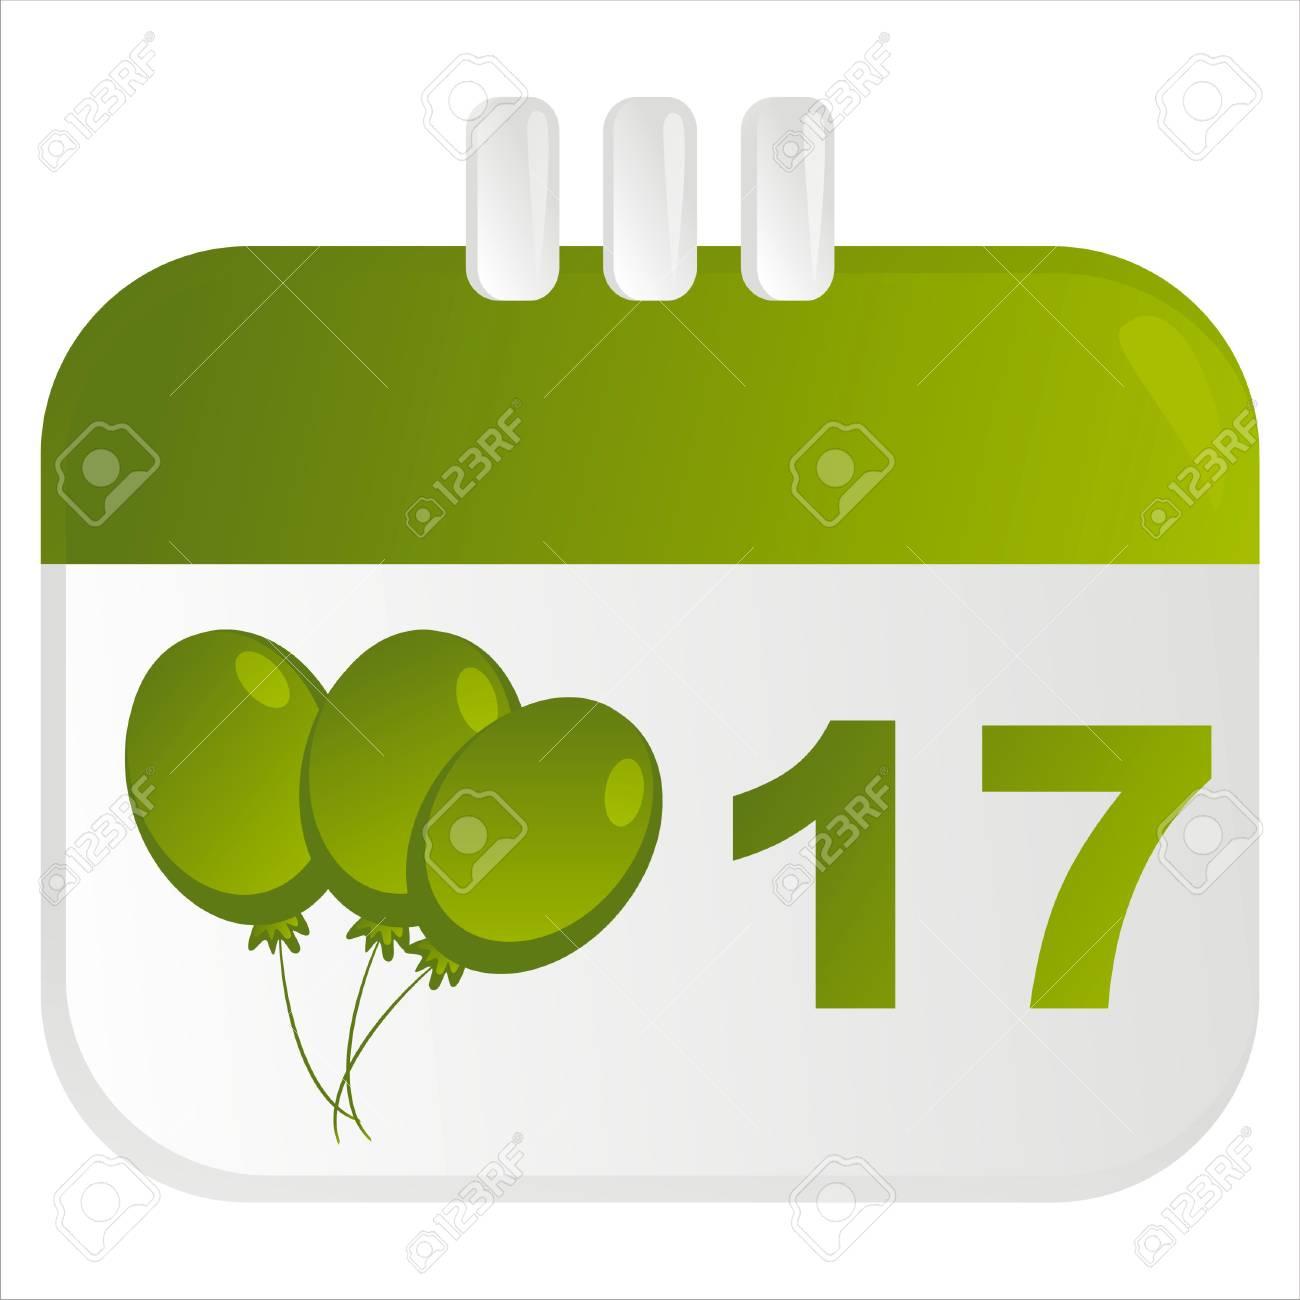 st. patrick's day calendar icon Stock Vector - 8898552